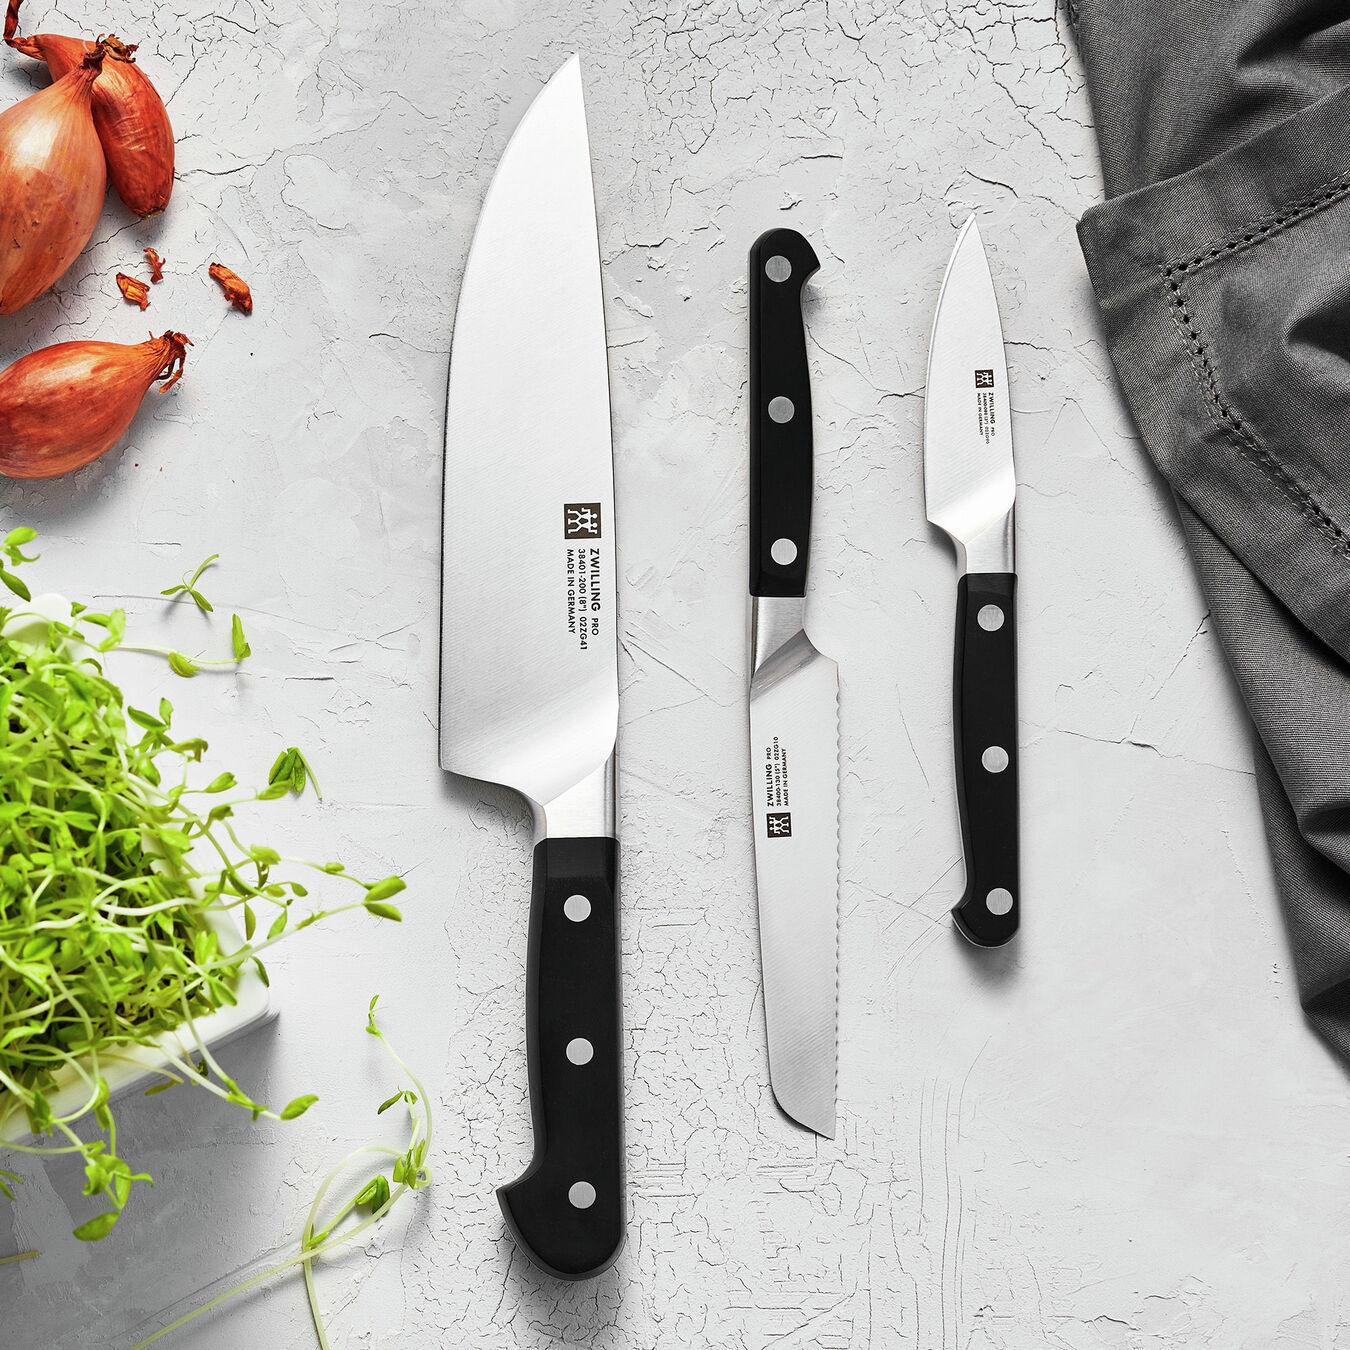 3-pc, Starter Knife Set,,large 8